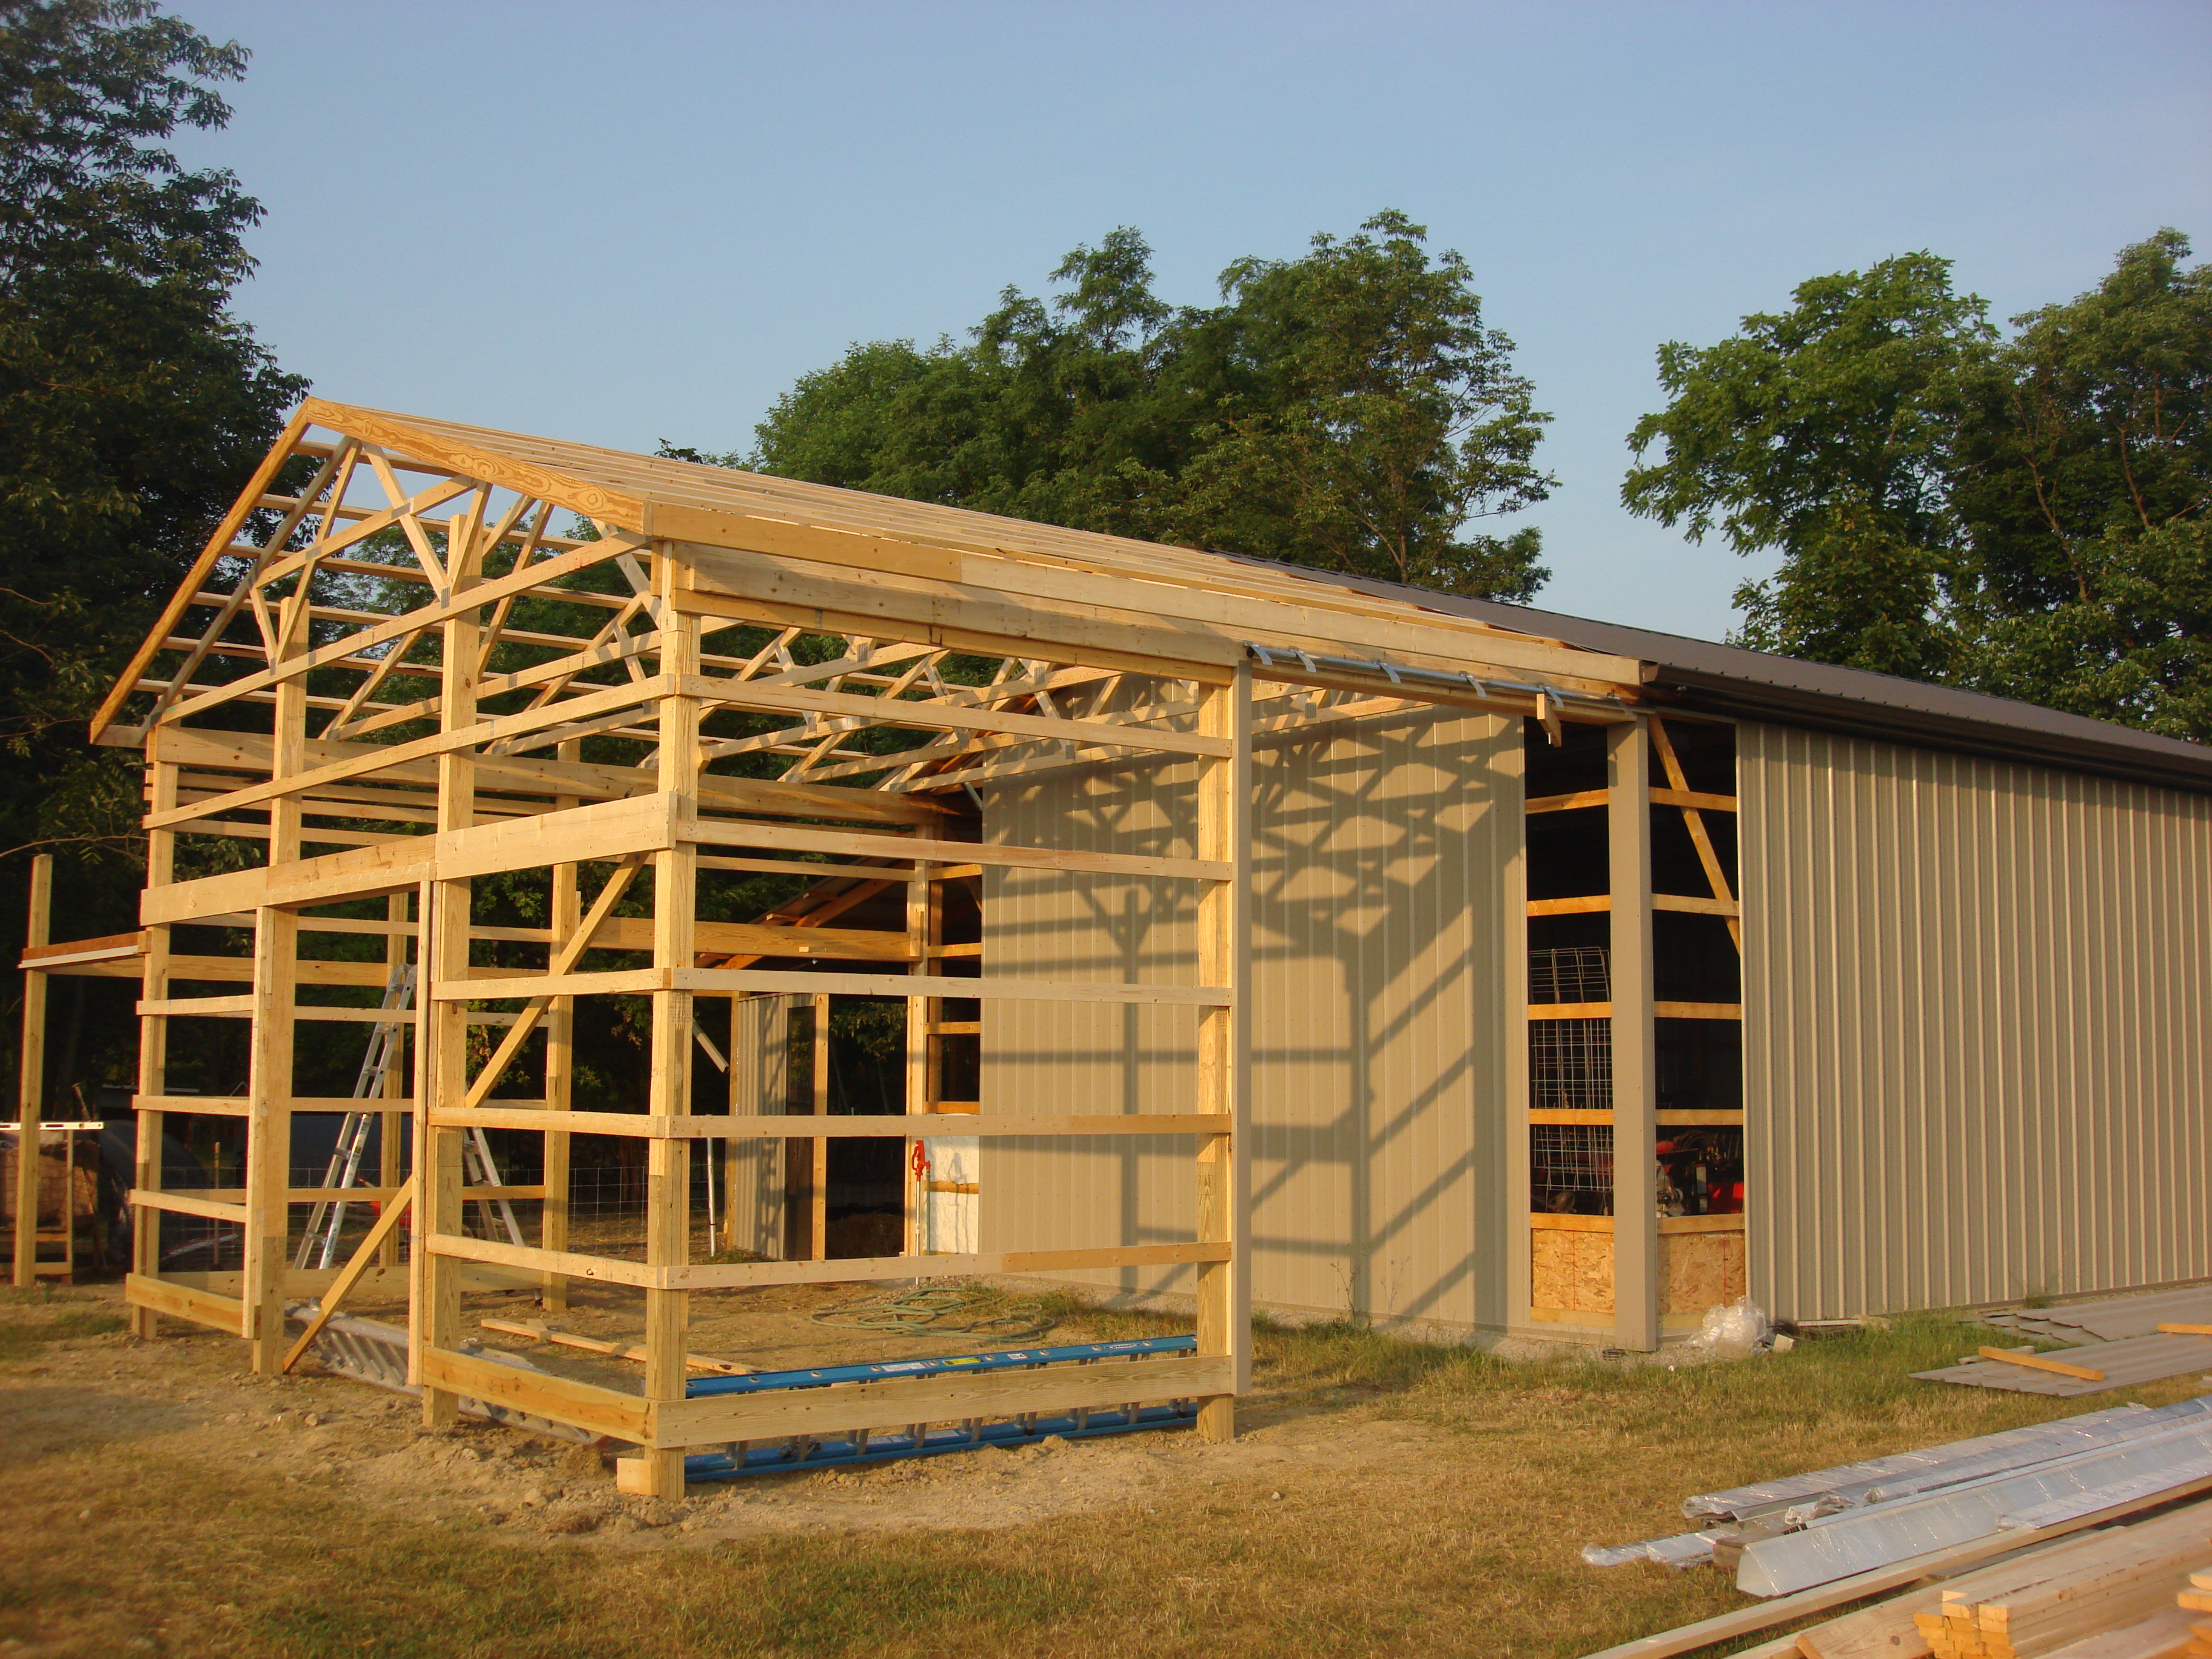 Southern Illinois Pole Barn Cabins Joy Studio Design